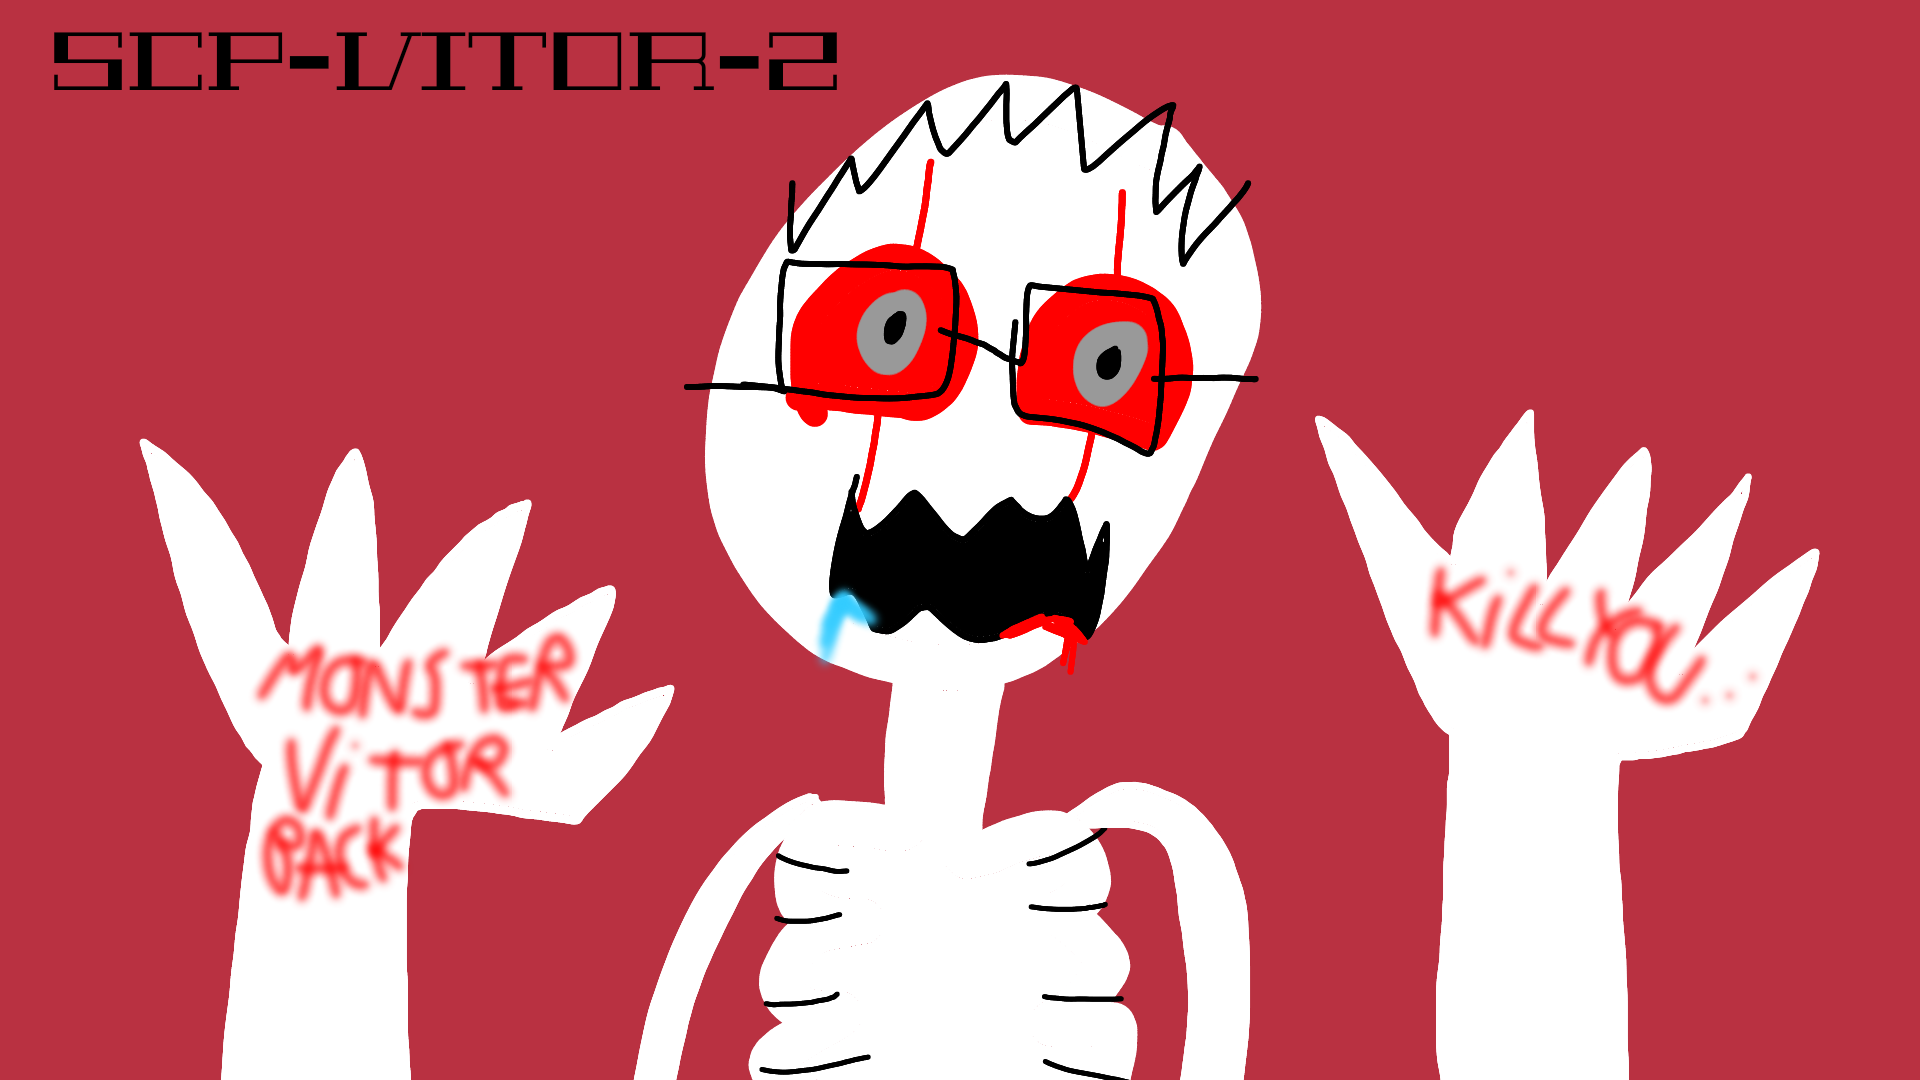 Monster Vitor SCP-VITOR-2